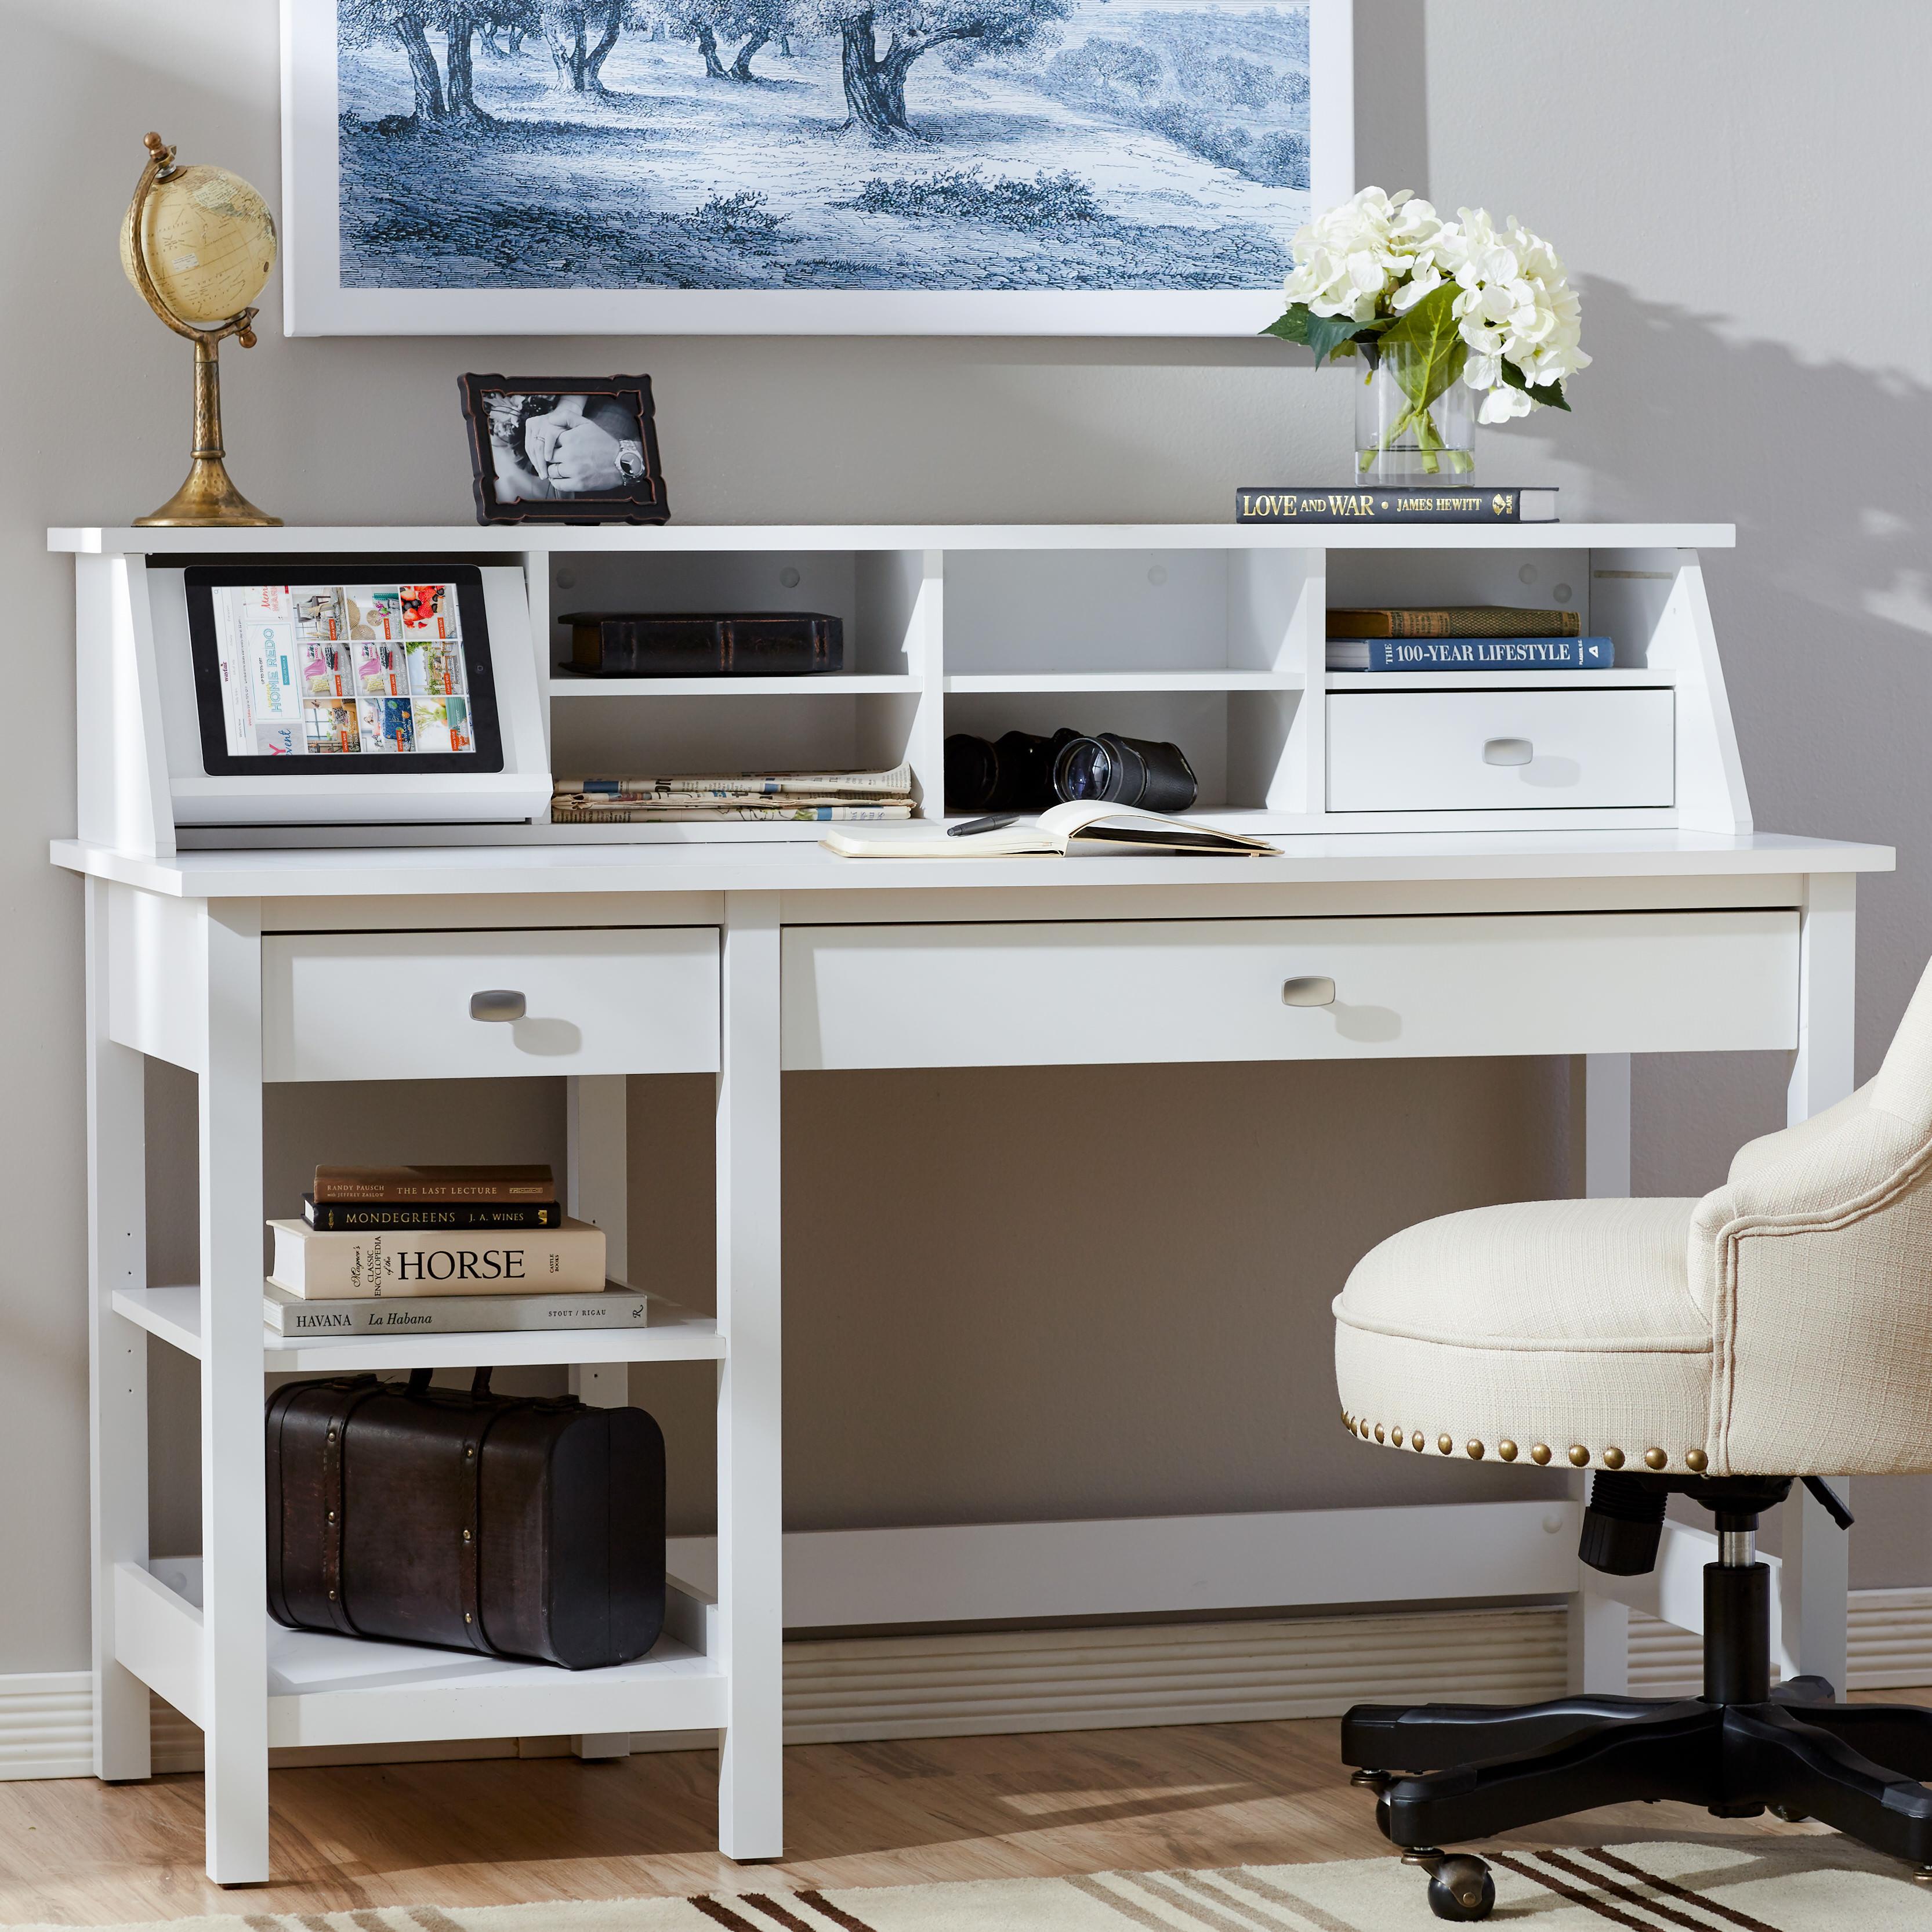 Types Of Desks white wooden bed guard 2 bedroom duplex house plans